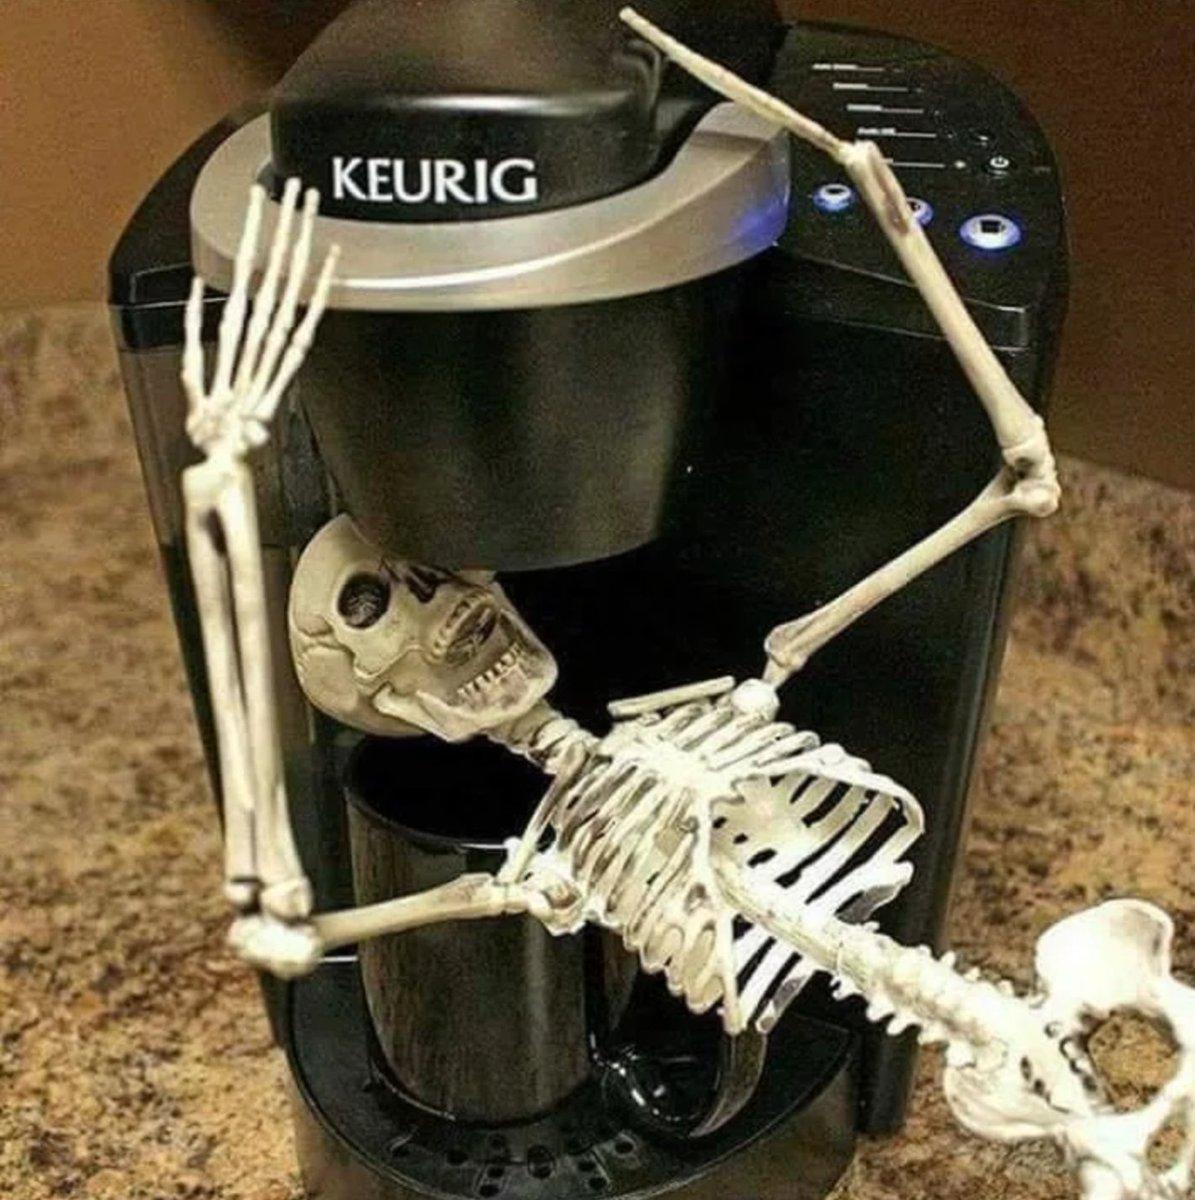 #SaturdayMorning get me more coffee. @Strongislandni2